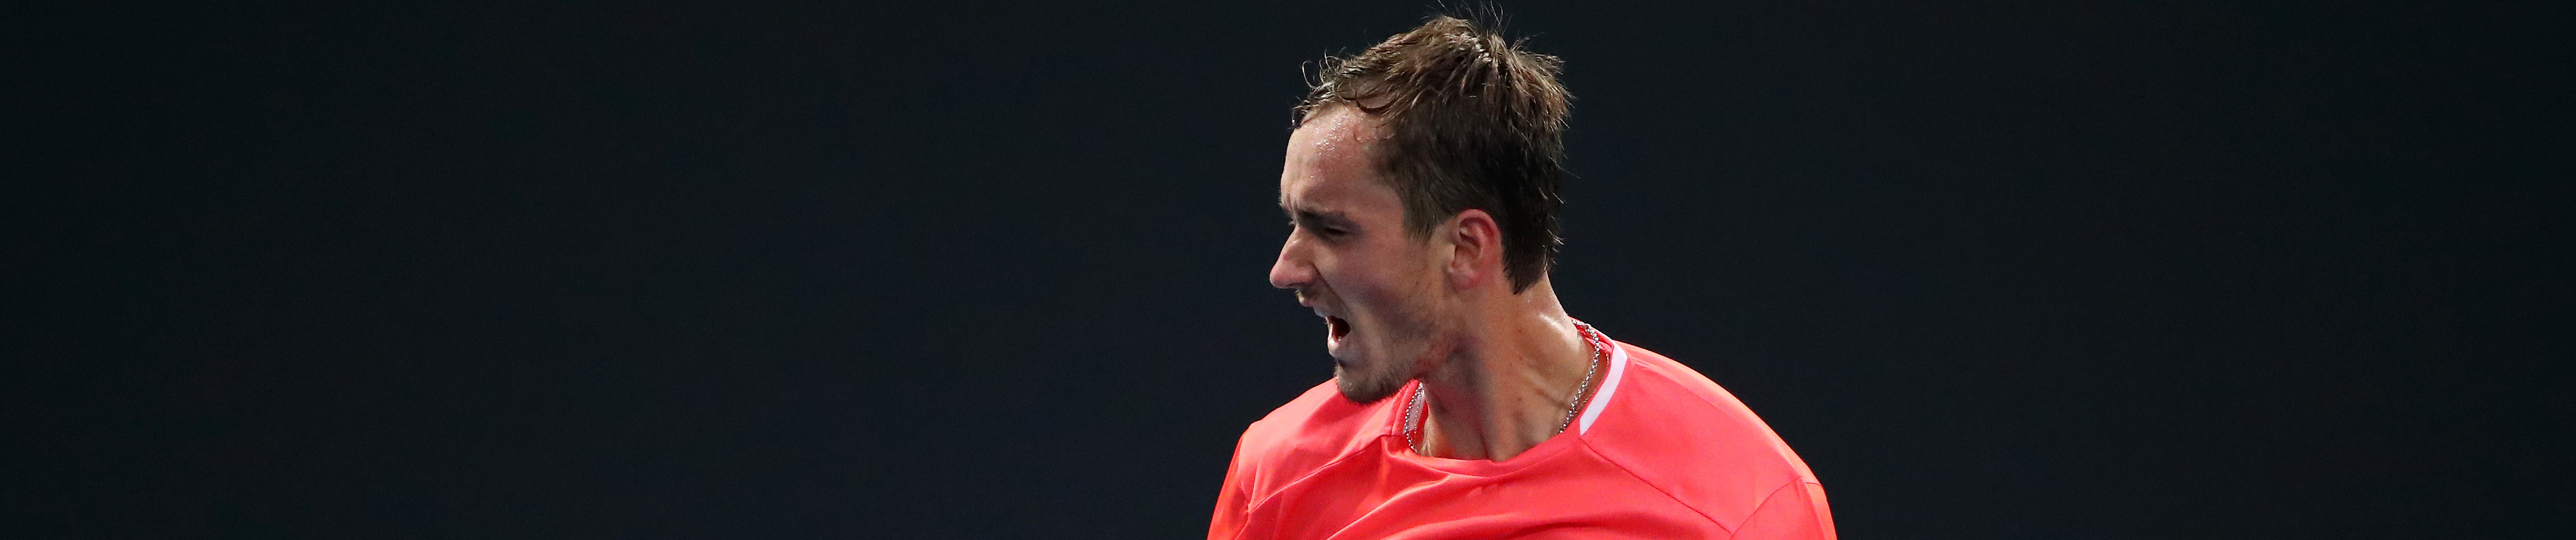 Masters 1000 Cincinnati: derby russo per Medvedev, Venus per stupire ancora